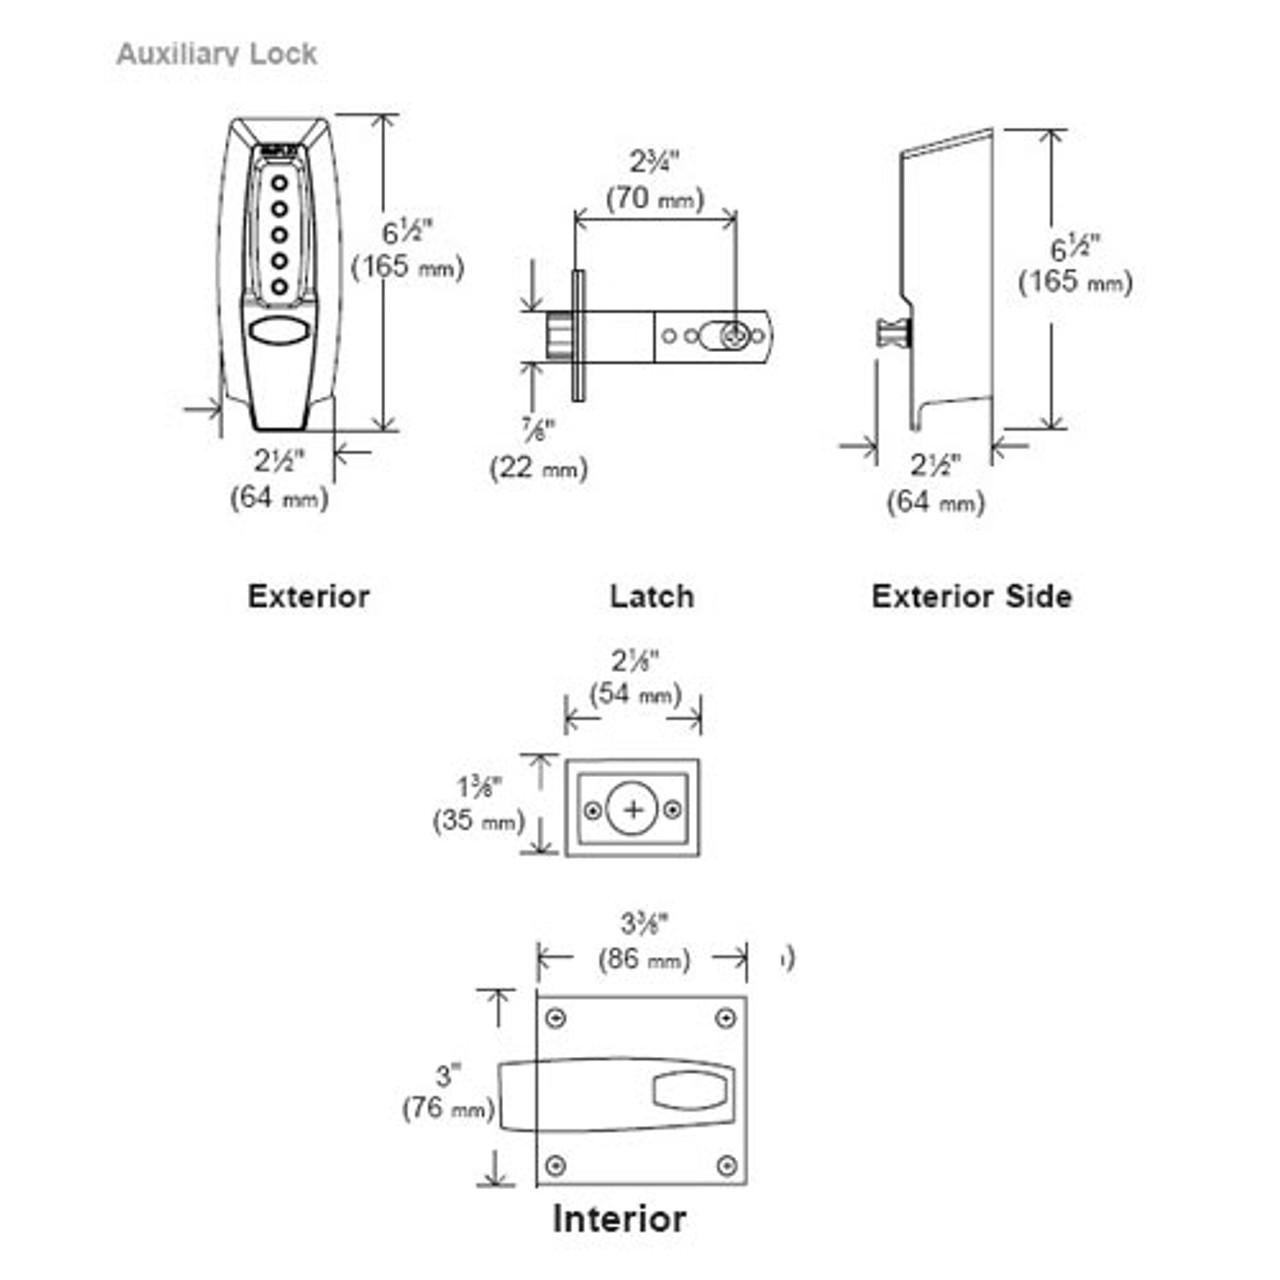 medium resolution of 7106 19 41 simplex pushbutton keyless latch lock in black lock simplex lock diagram source